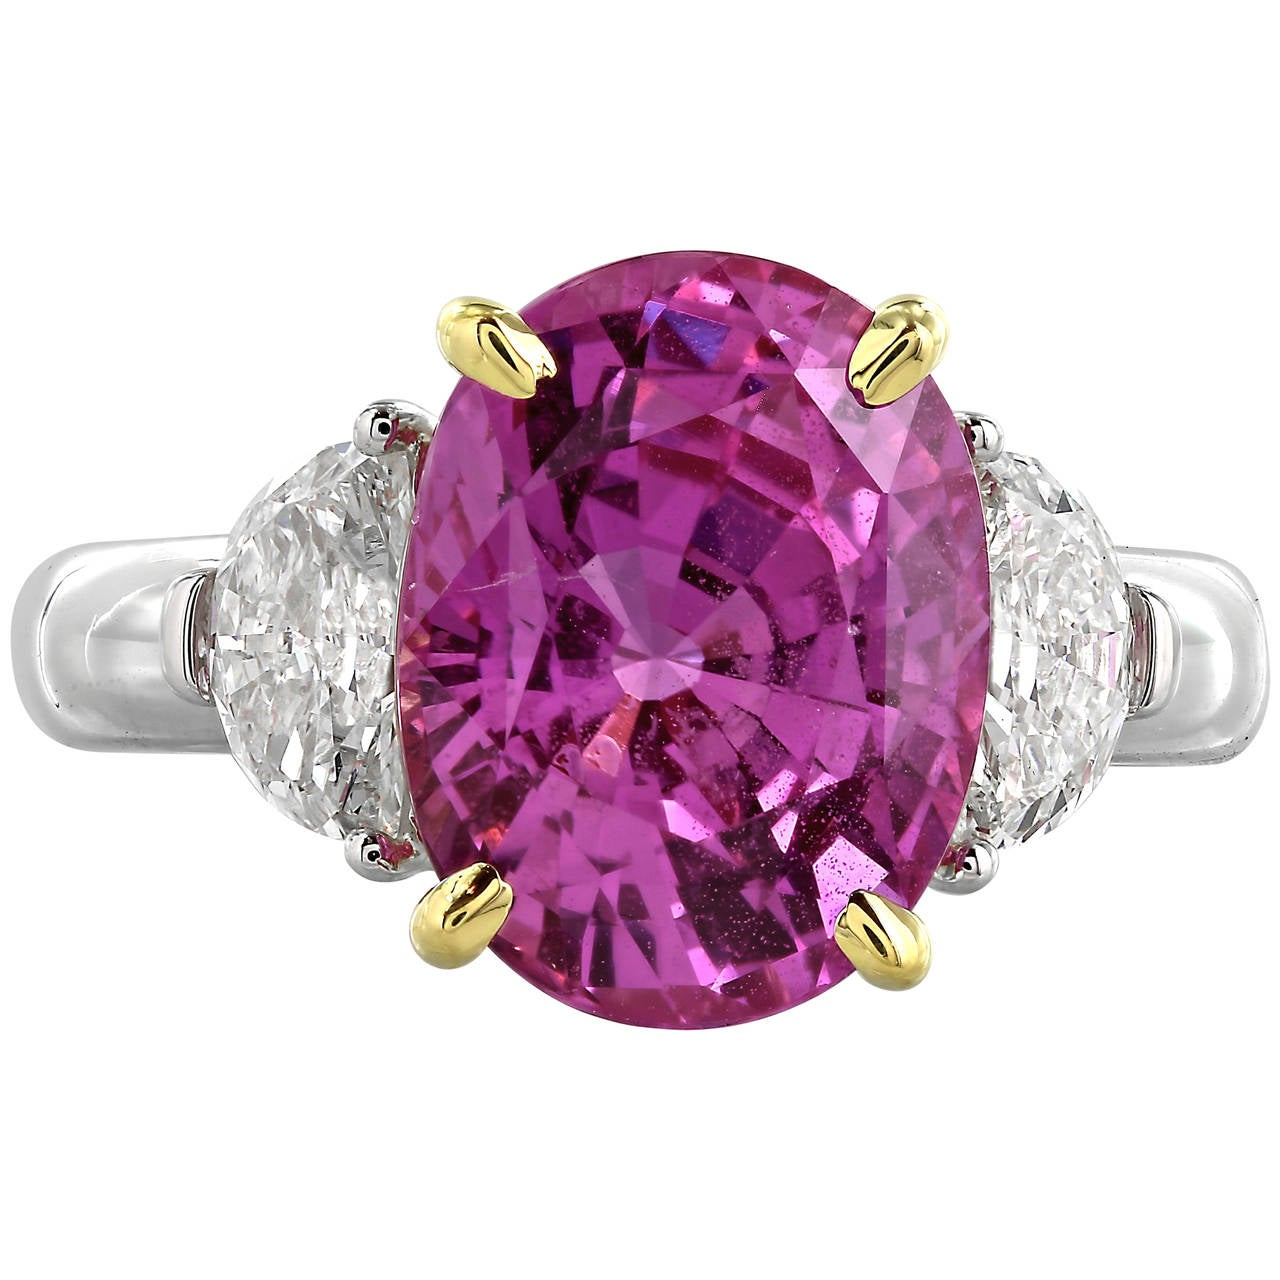 6.22 Carat Pink Sapphire and Diamond Ring